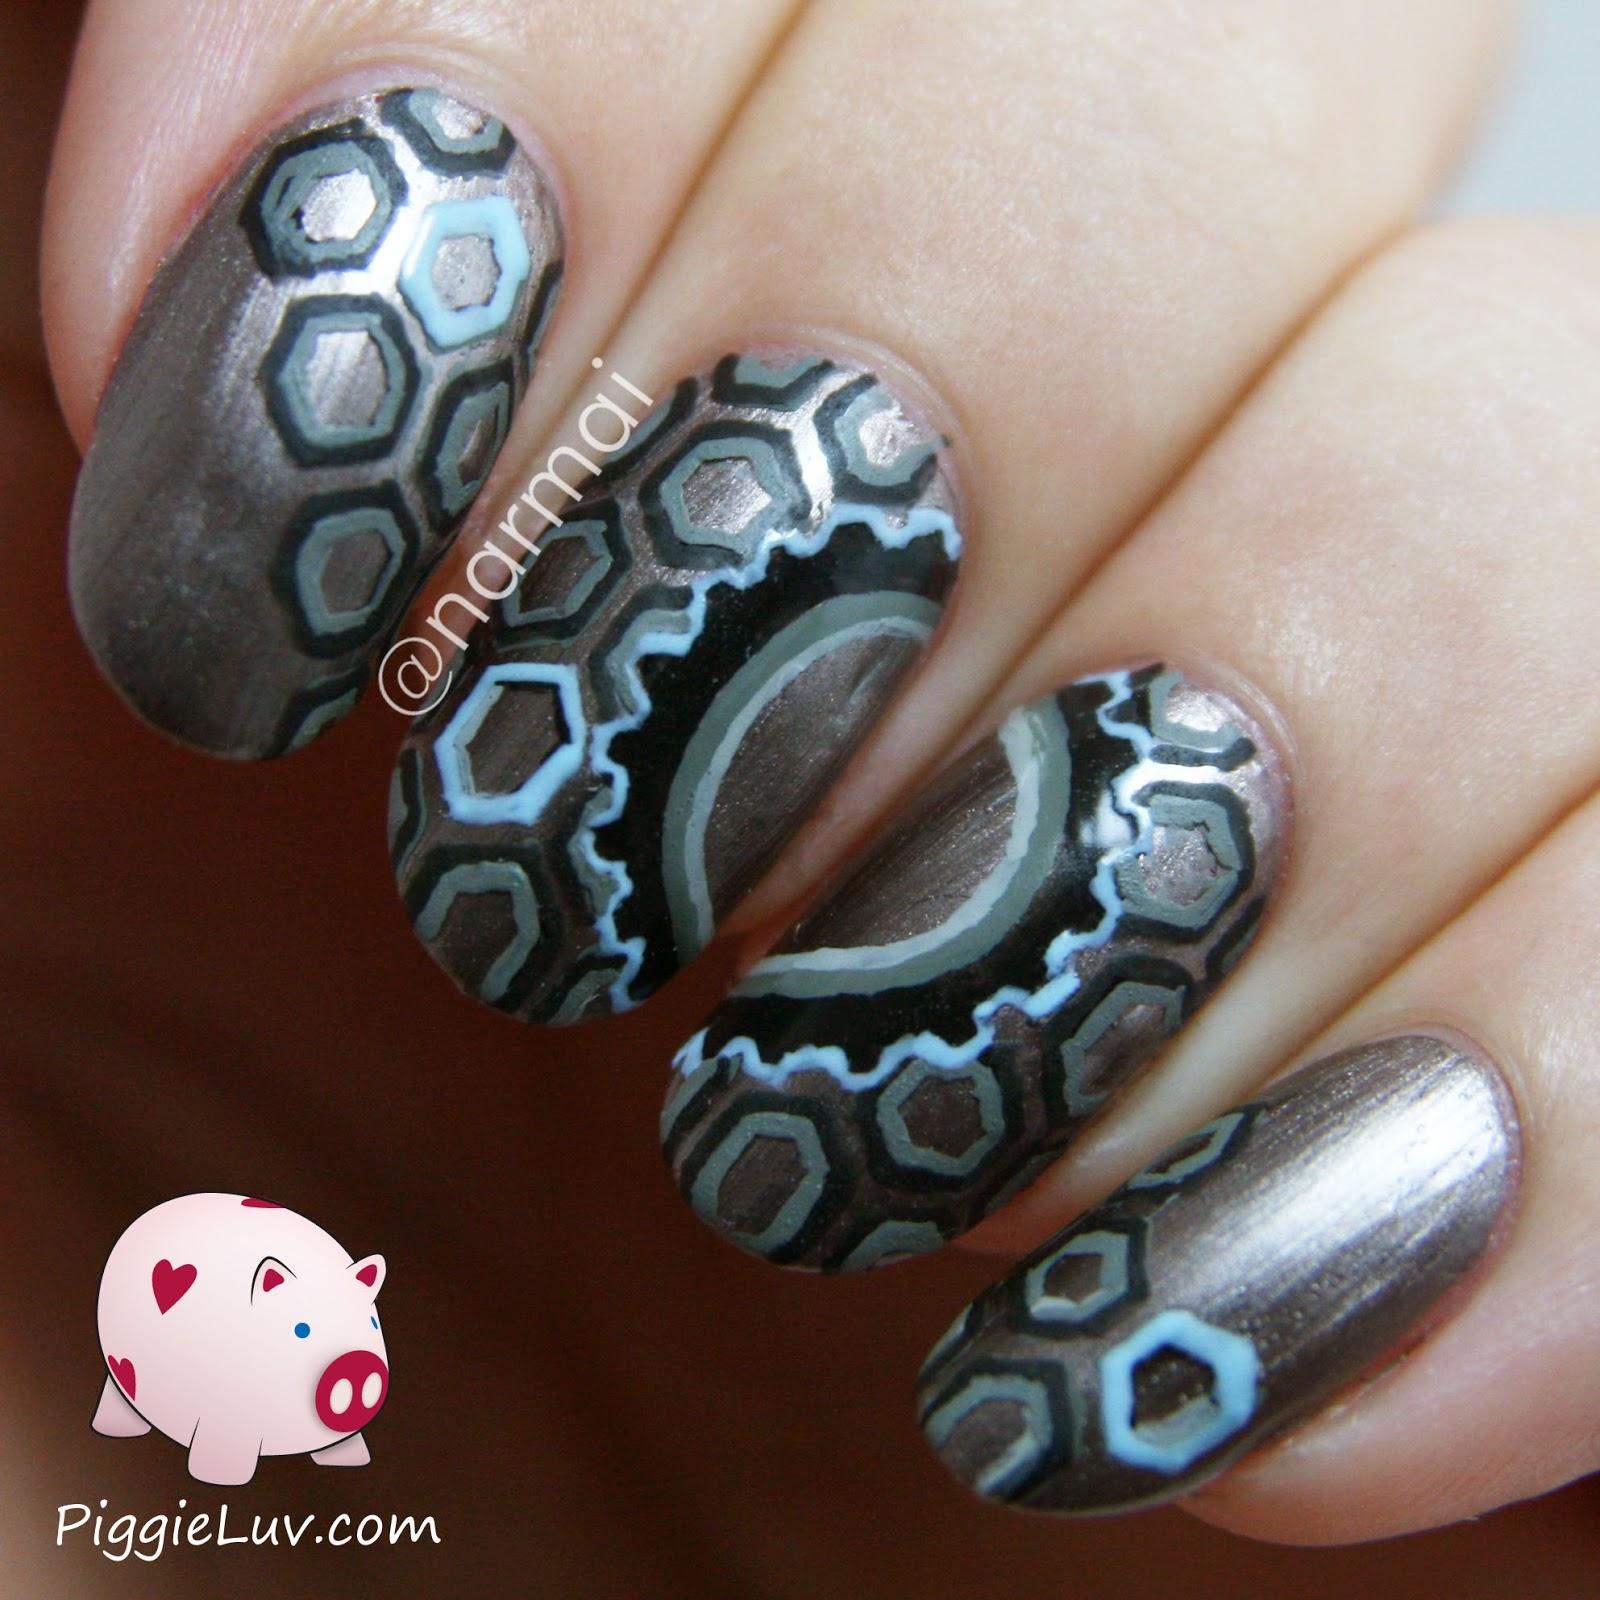 Piggieluv technologic wheels cogs nail art technologic wheels cogs nail art prinsesfo Image collections